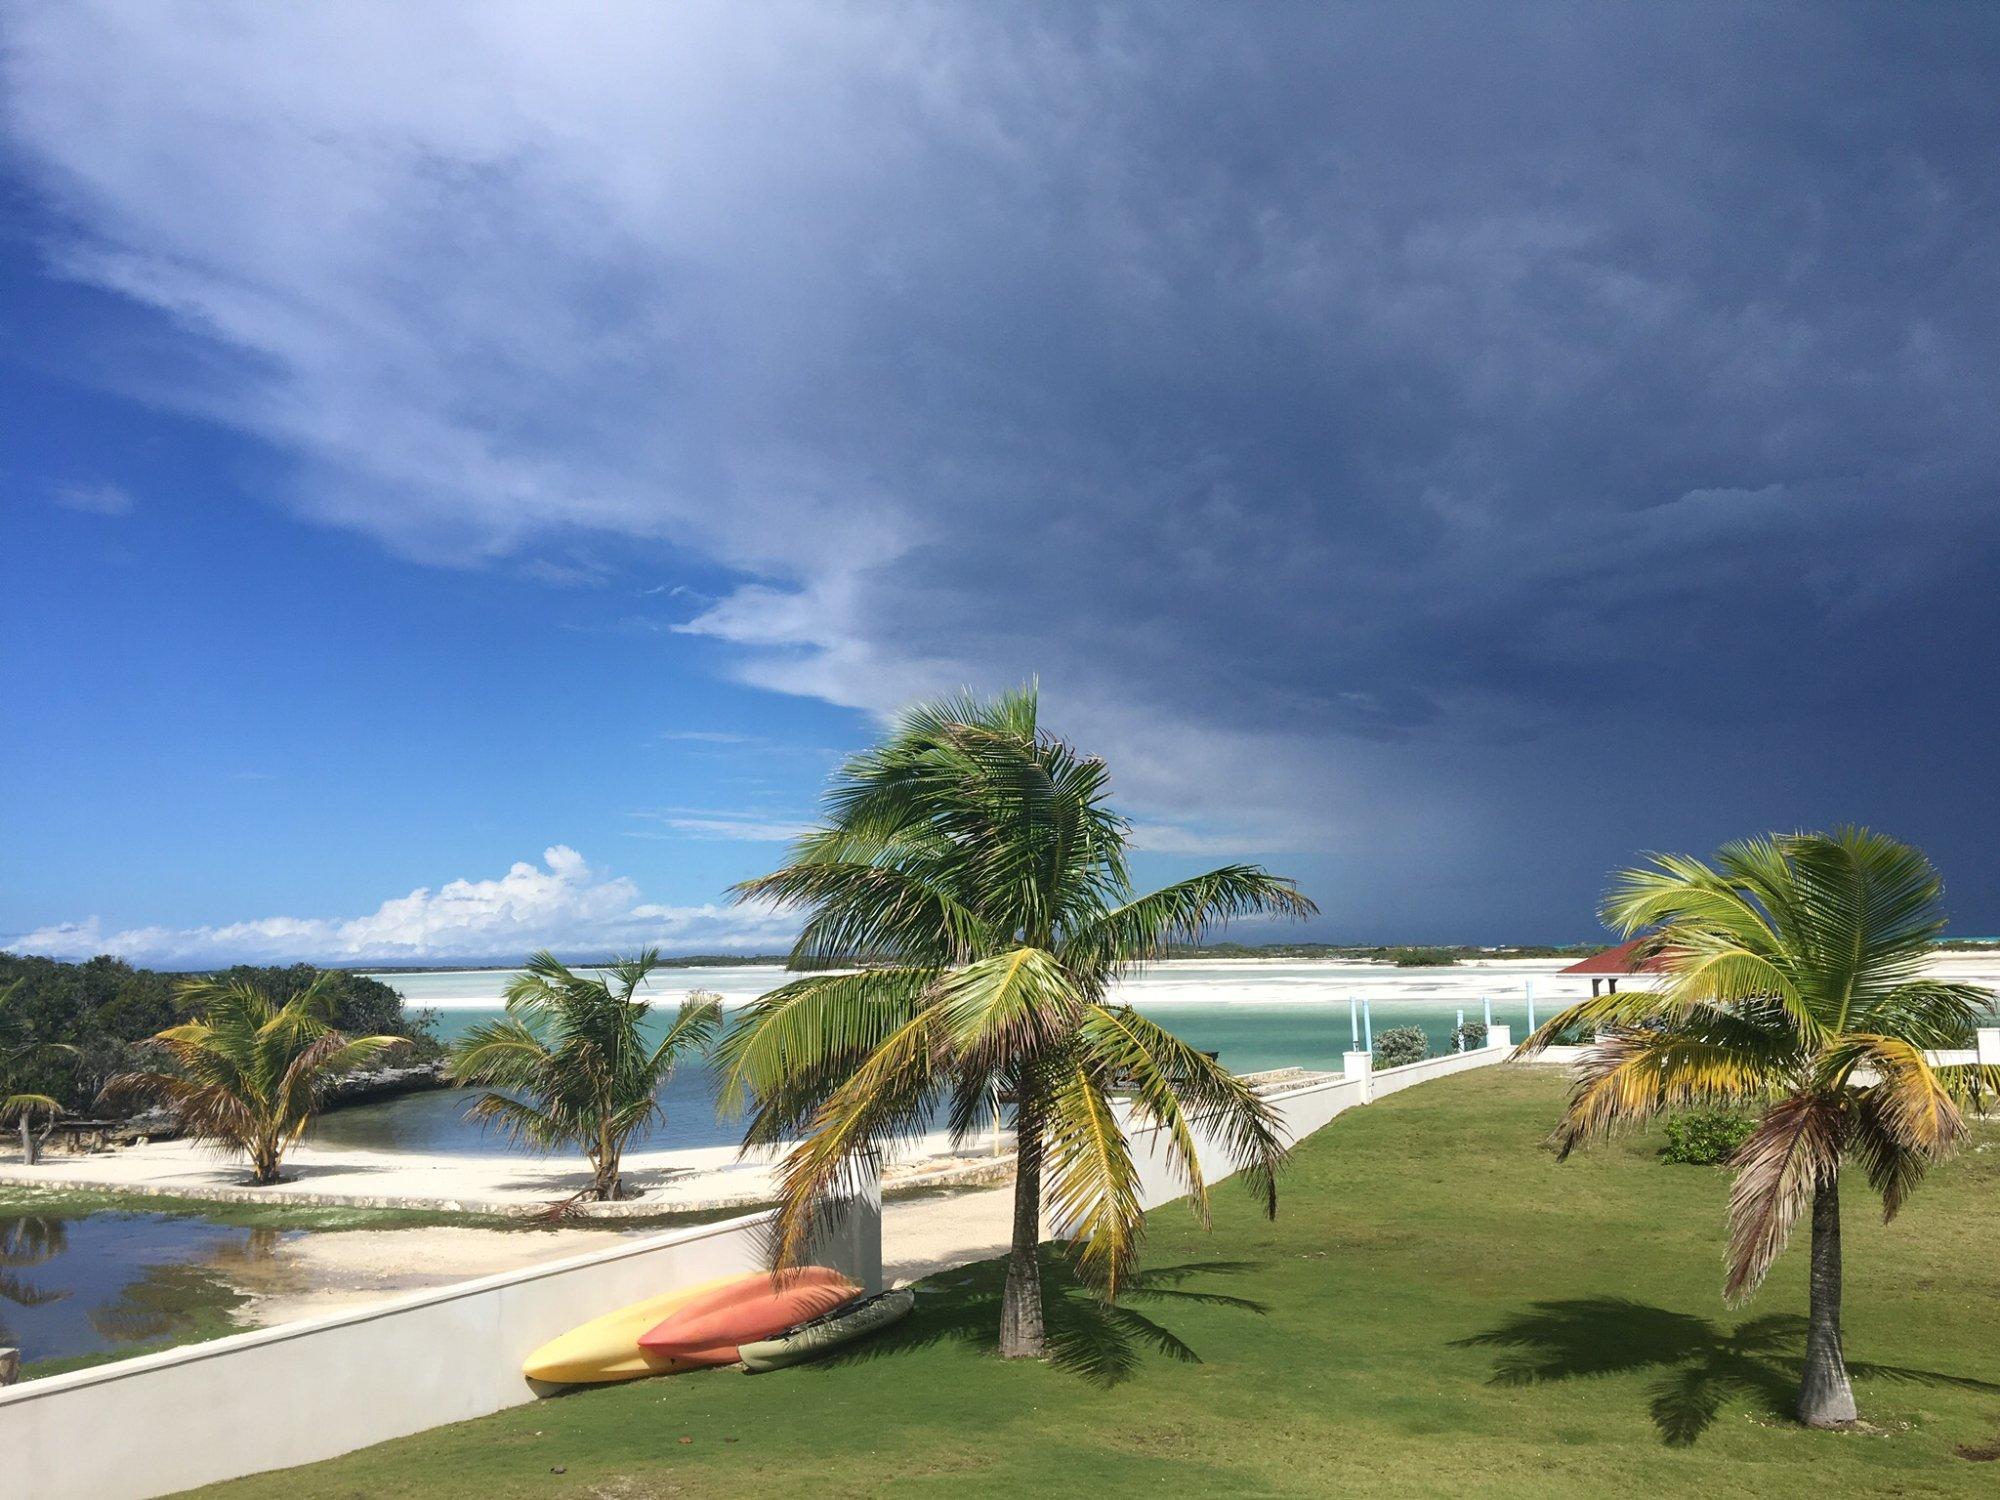 L'orage approche! (Bay view vacation rental villa #1)